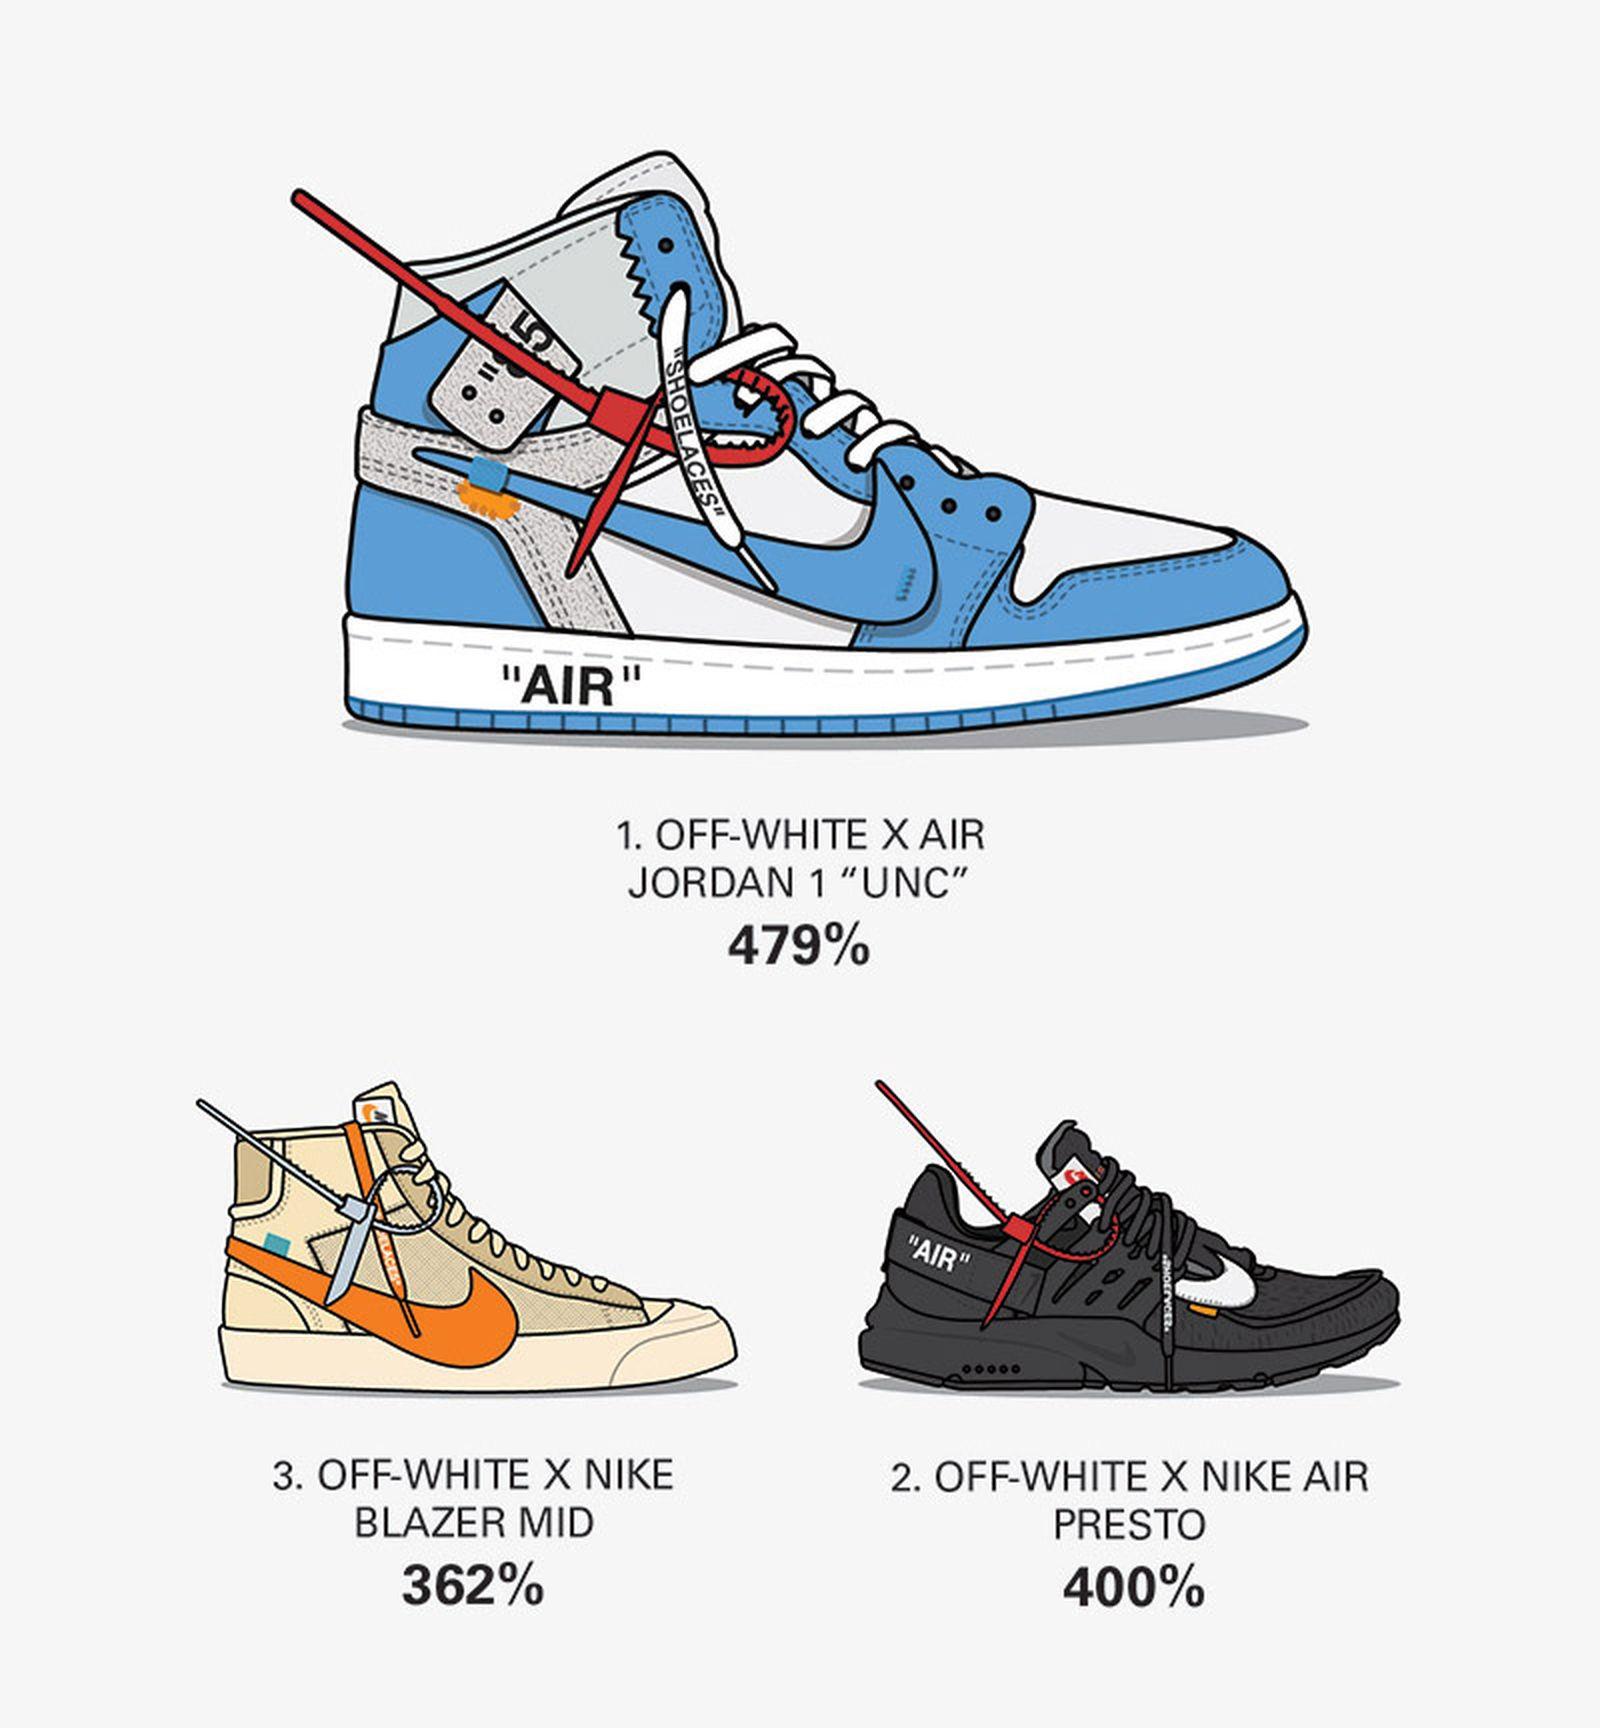 sneaker sales 2018 stockx Adidas Nike OFF-WHITE c/o Virgil Abloh